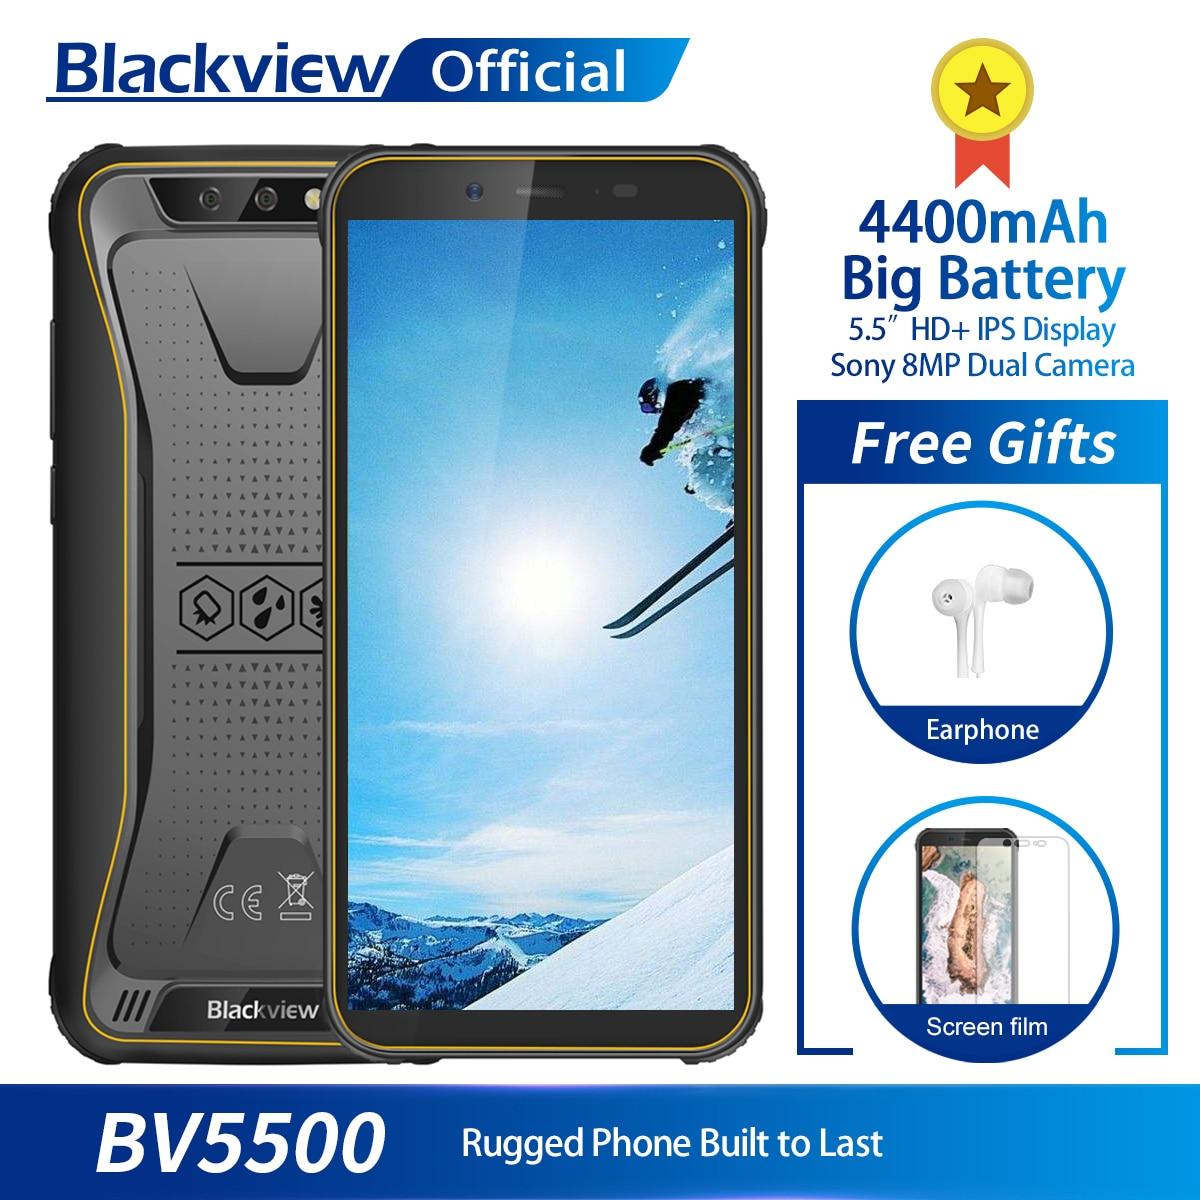 Фото. Blackview BV5500 MTK6580P Android 8,1 мобильный телефон 5,5 дюйм 18:9 экран 2 Гб + 16 Гб IP68 В